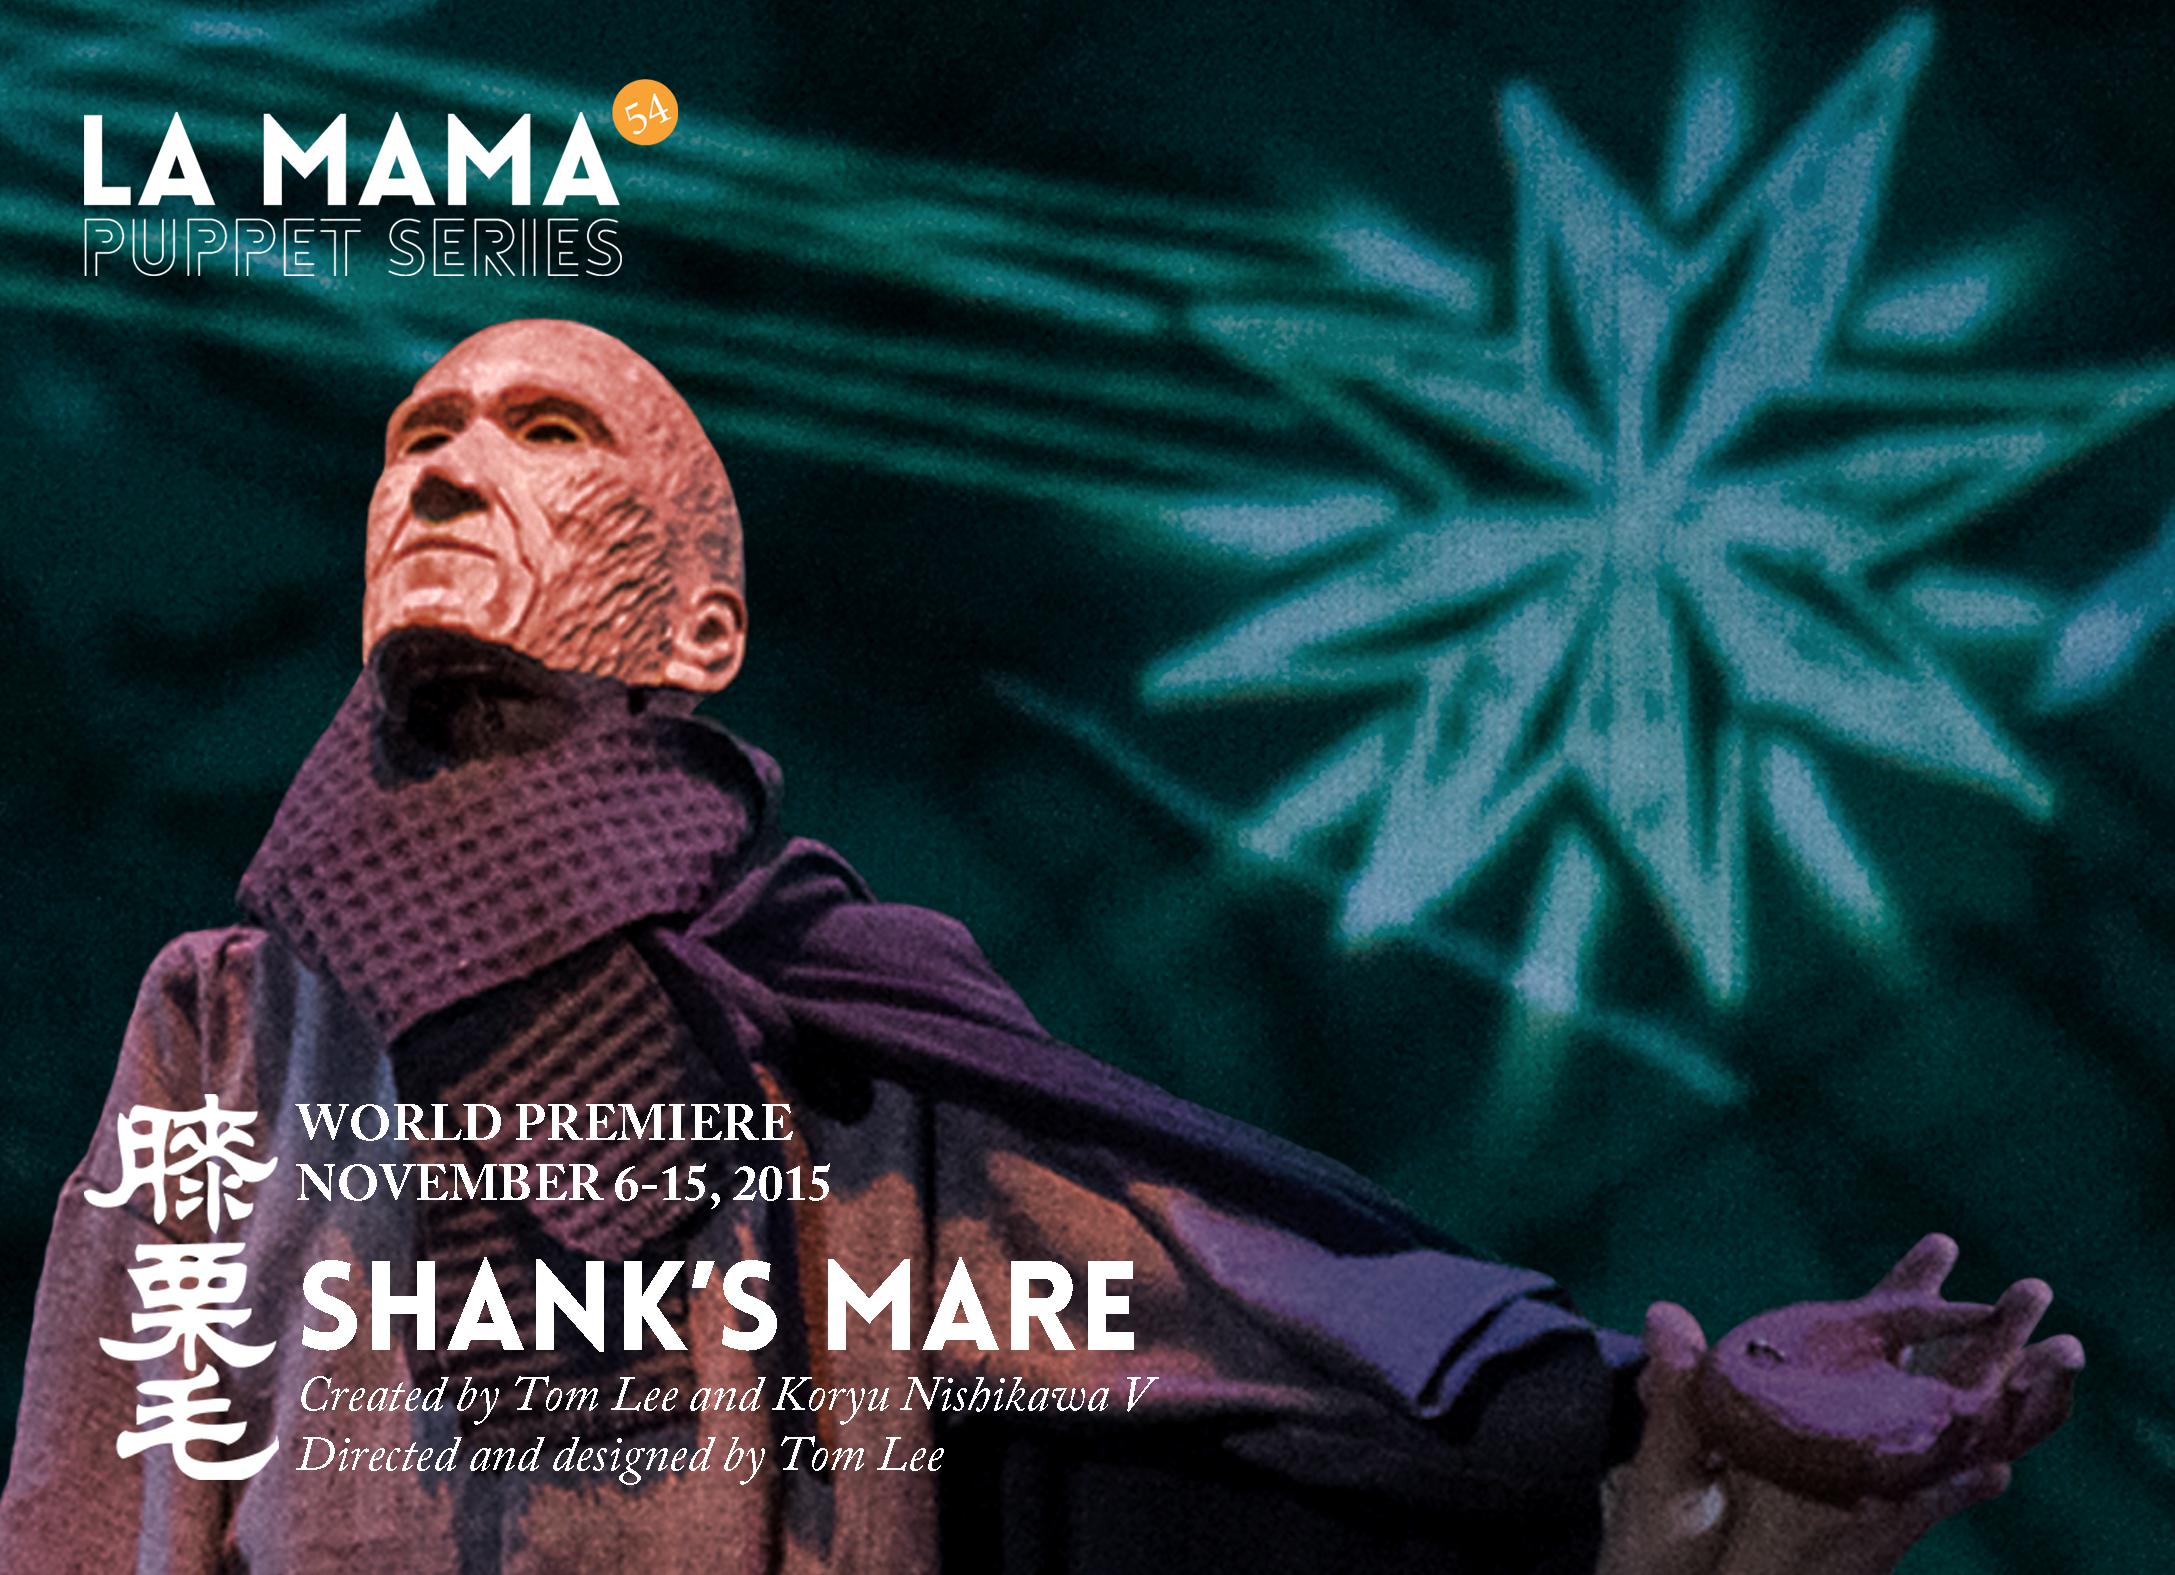 Shank's Mare